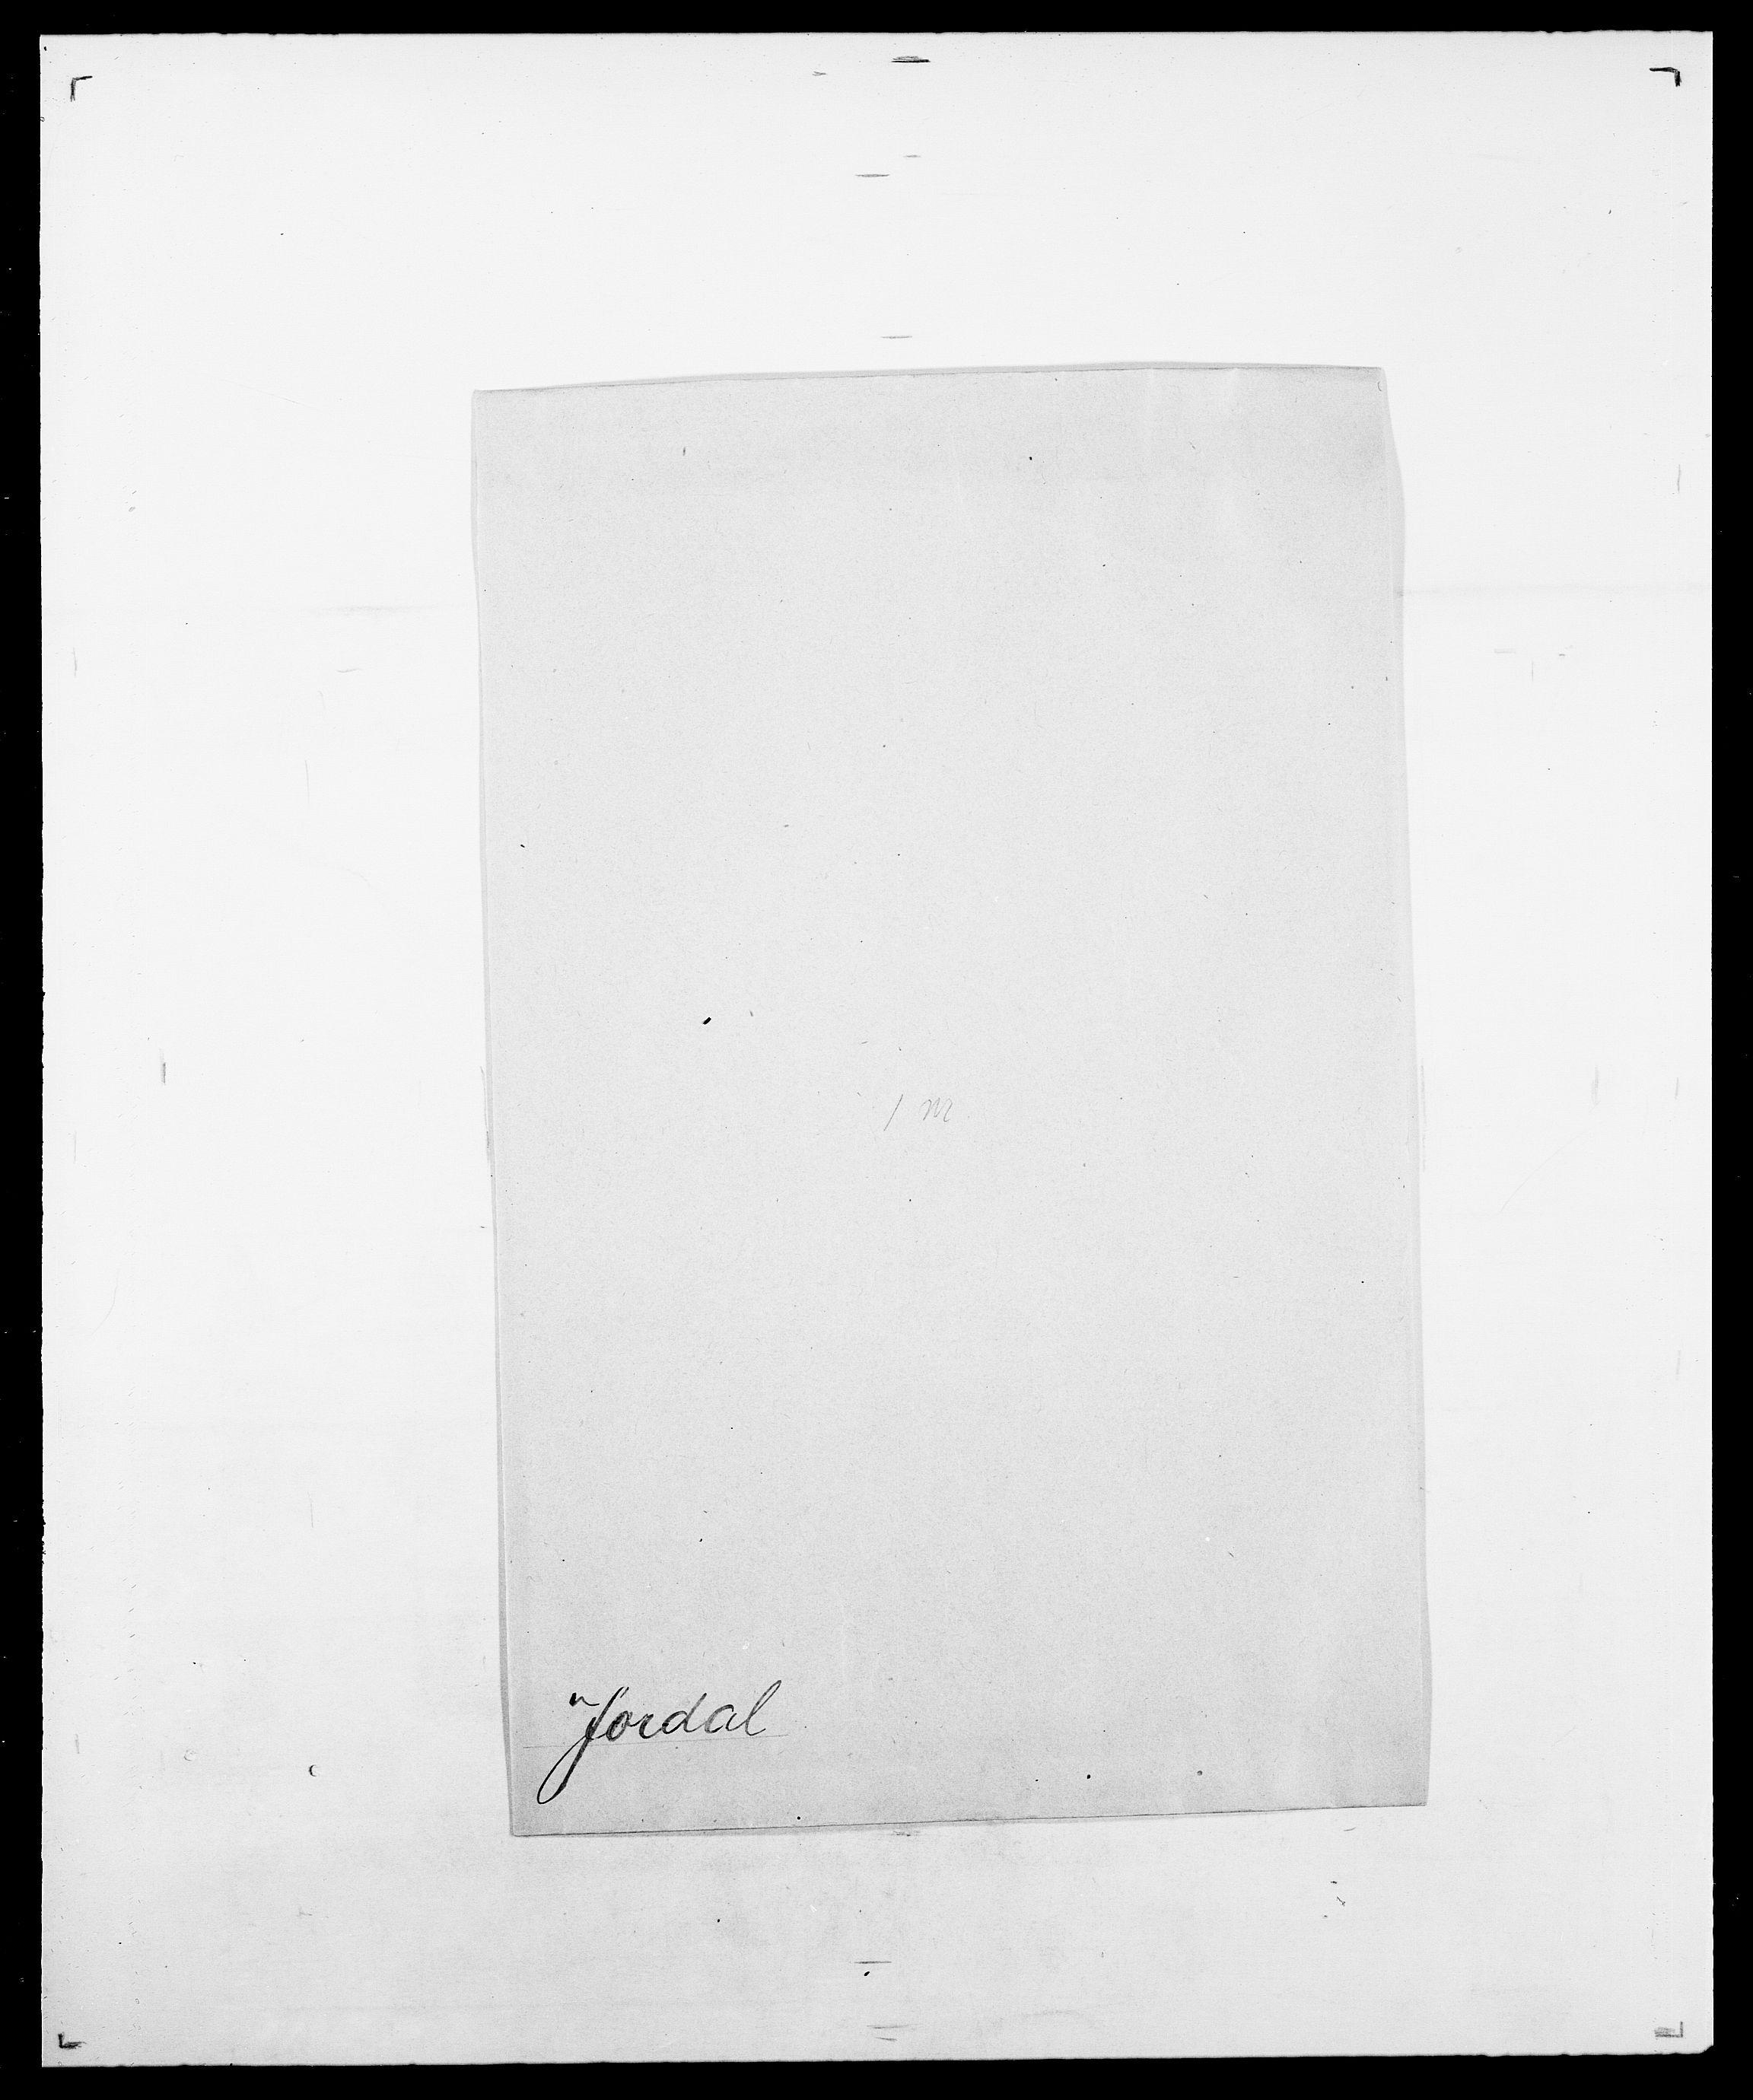 SAO, Delgobe, Charles Antoine - samling, D/Da/L0019: van der Hude - Joys, s. 888